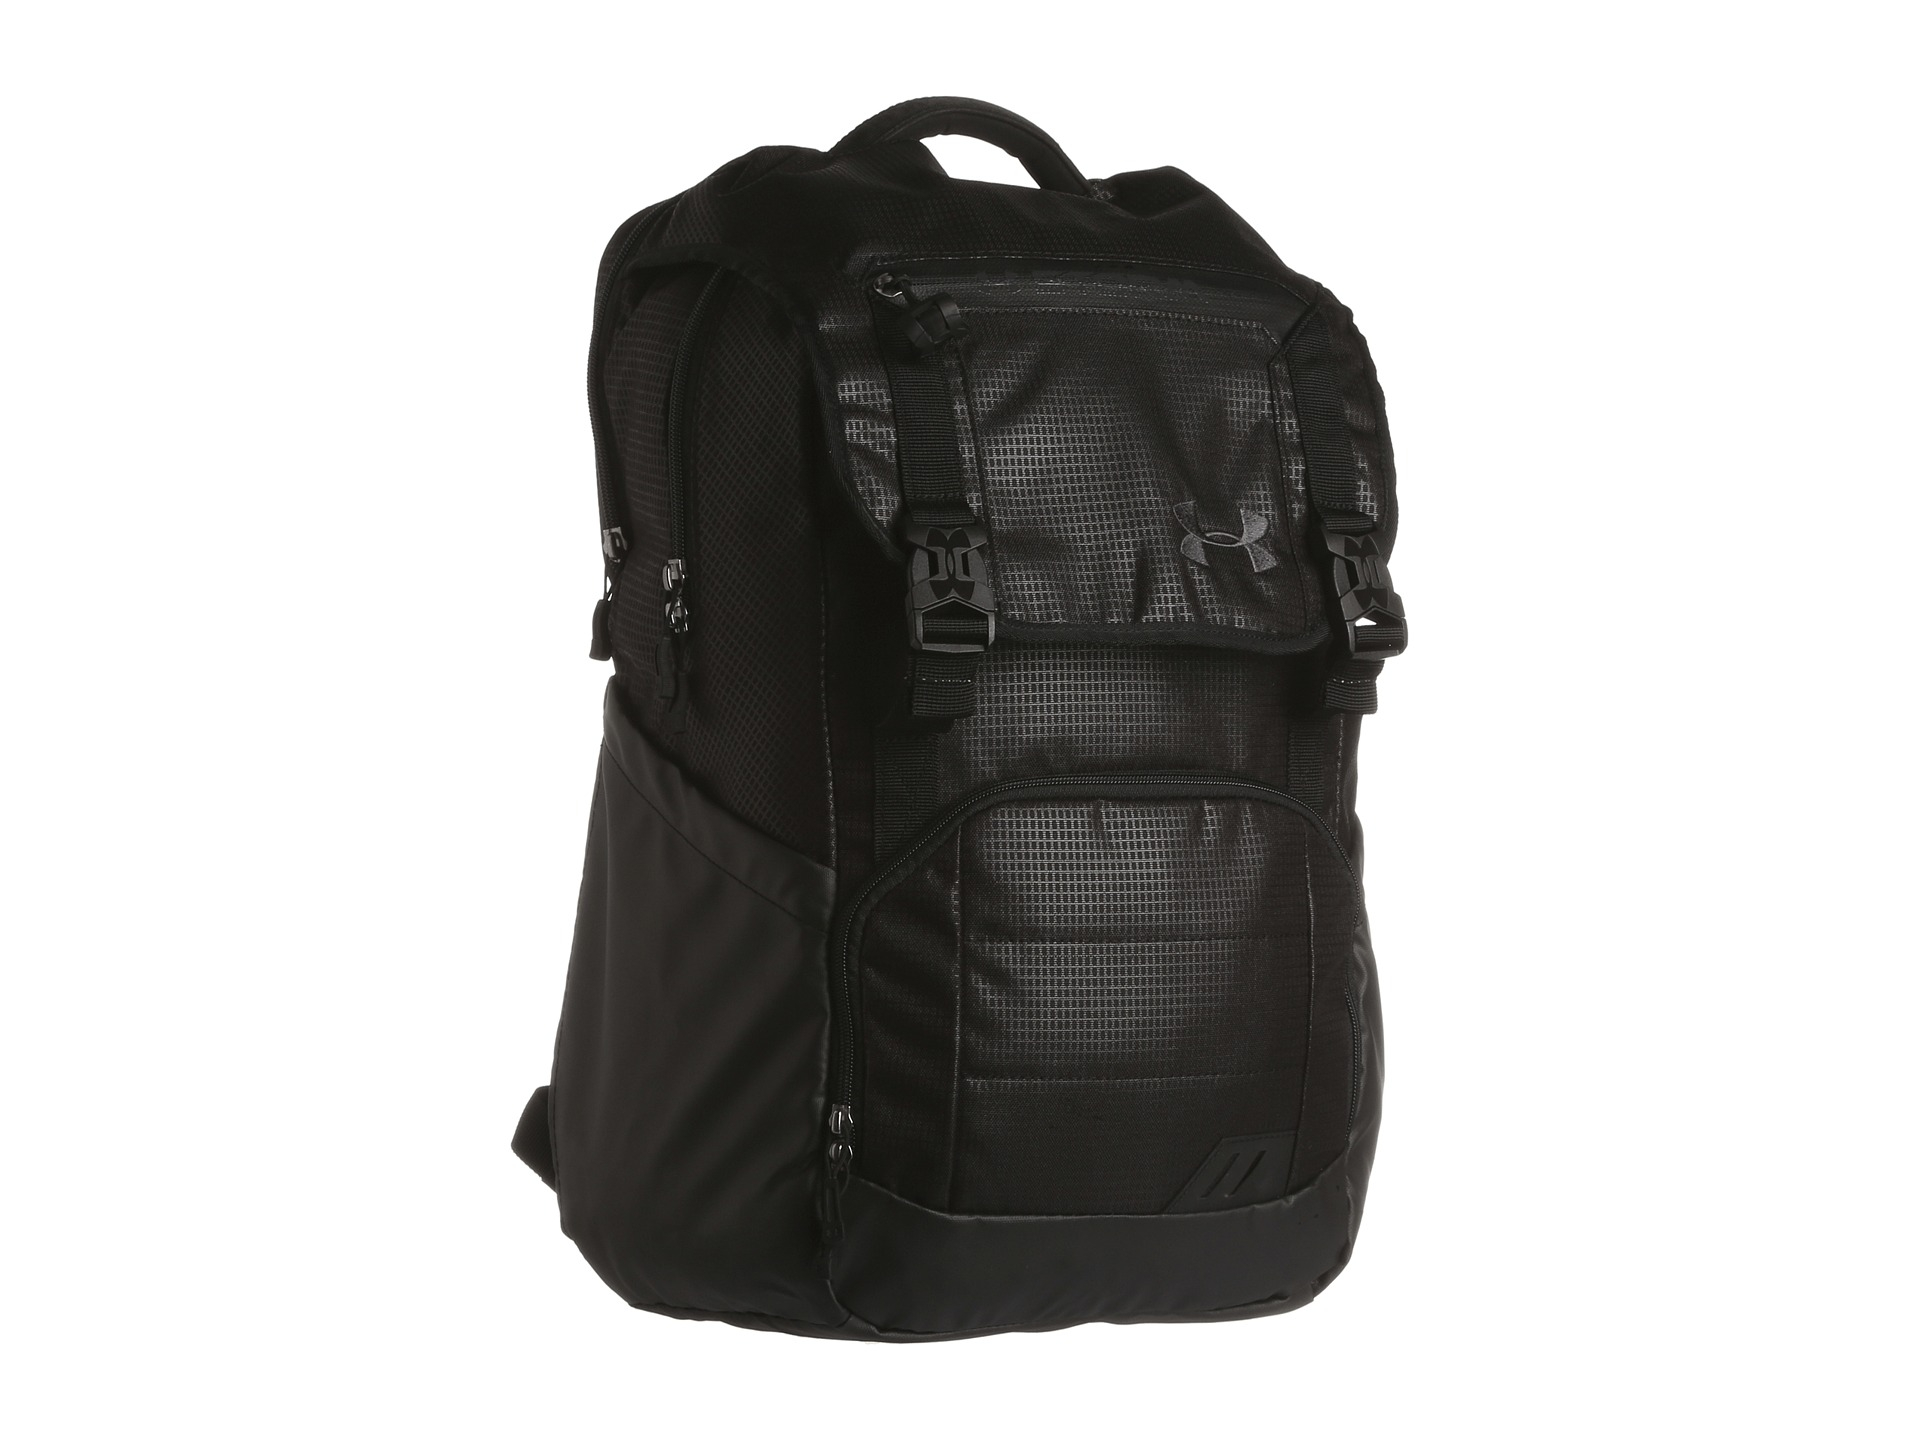 974525f66e Lyst - Under Armour Ua Ruckus Backpack in Black for Men